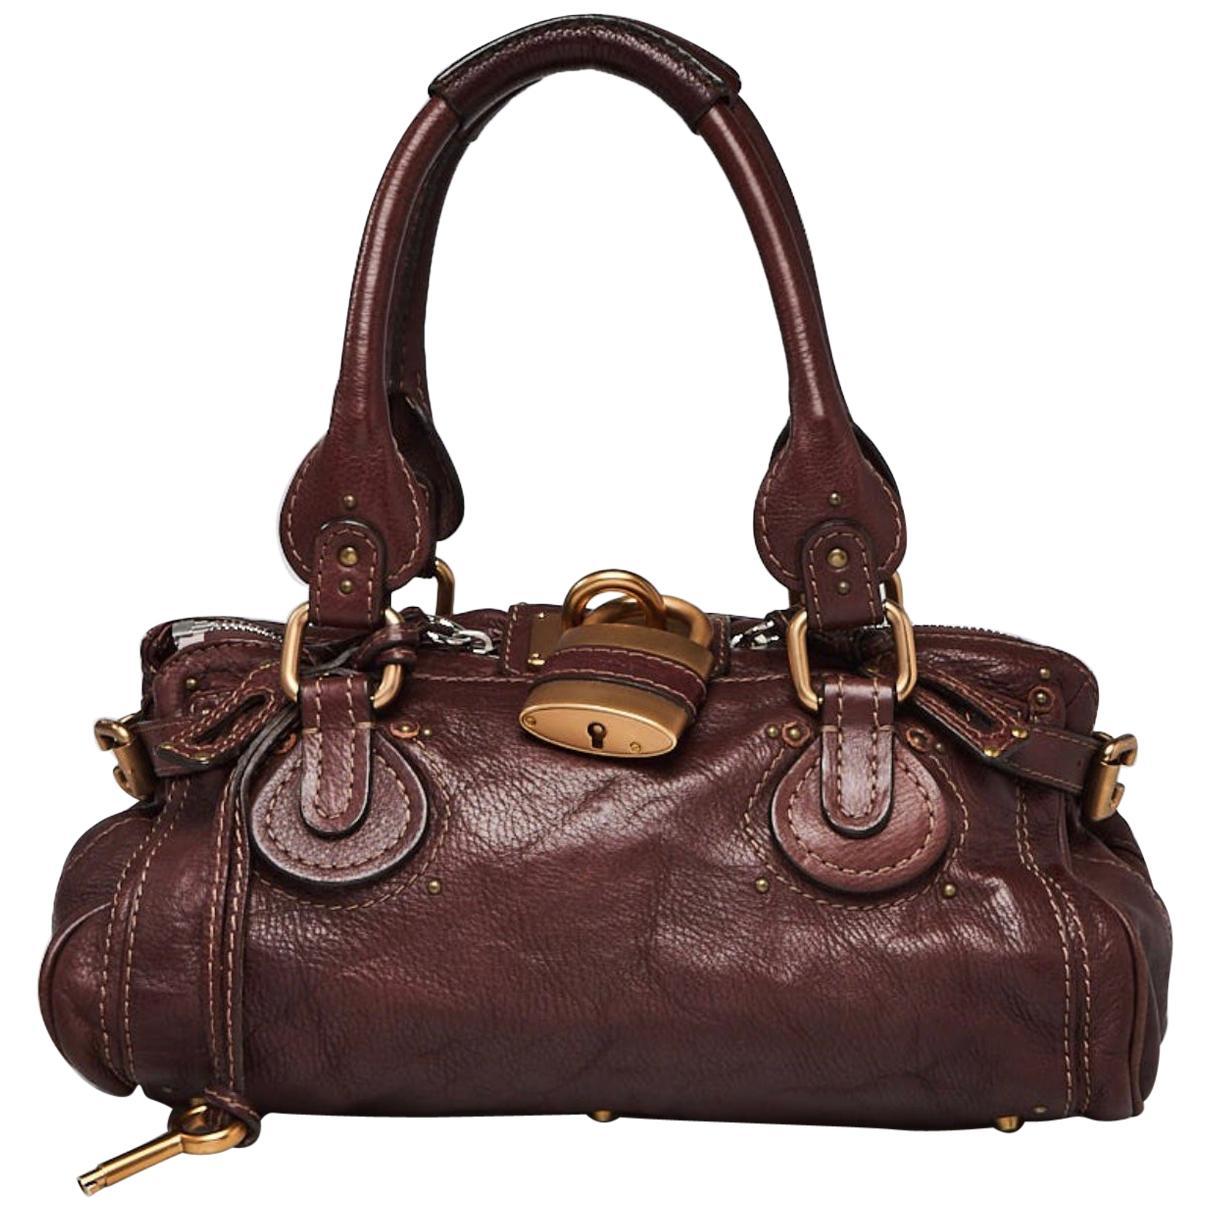 CHLOE Chocolate Brown Leather Paddington Medium Satchel Bag with Lock & Key